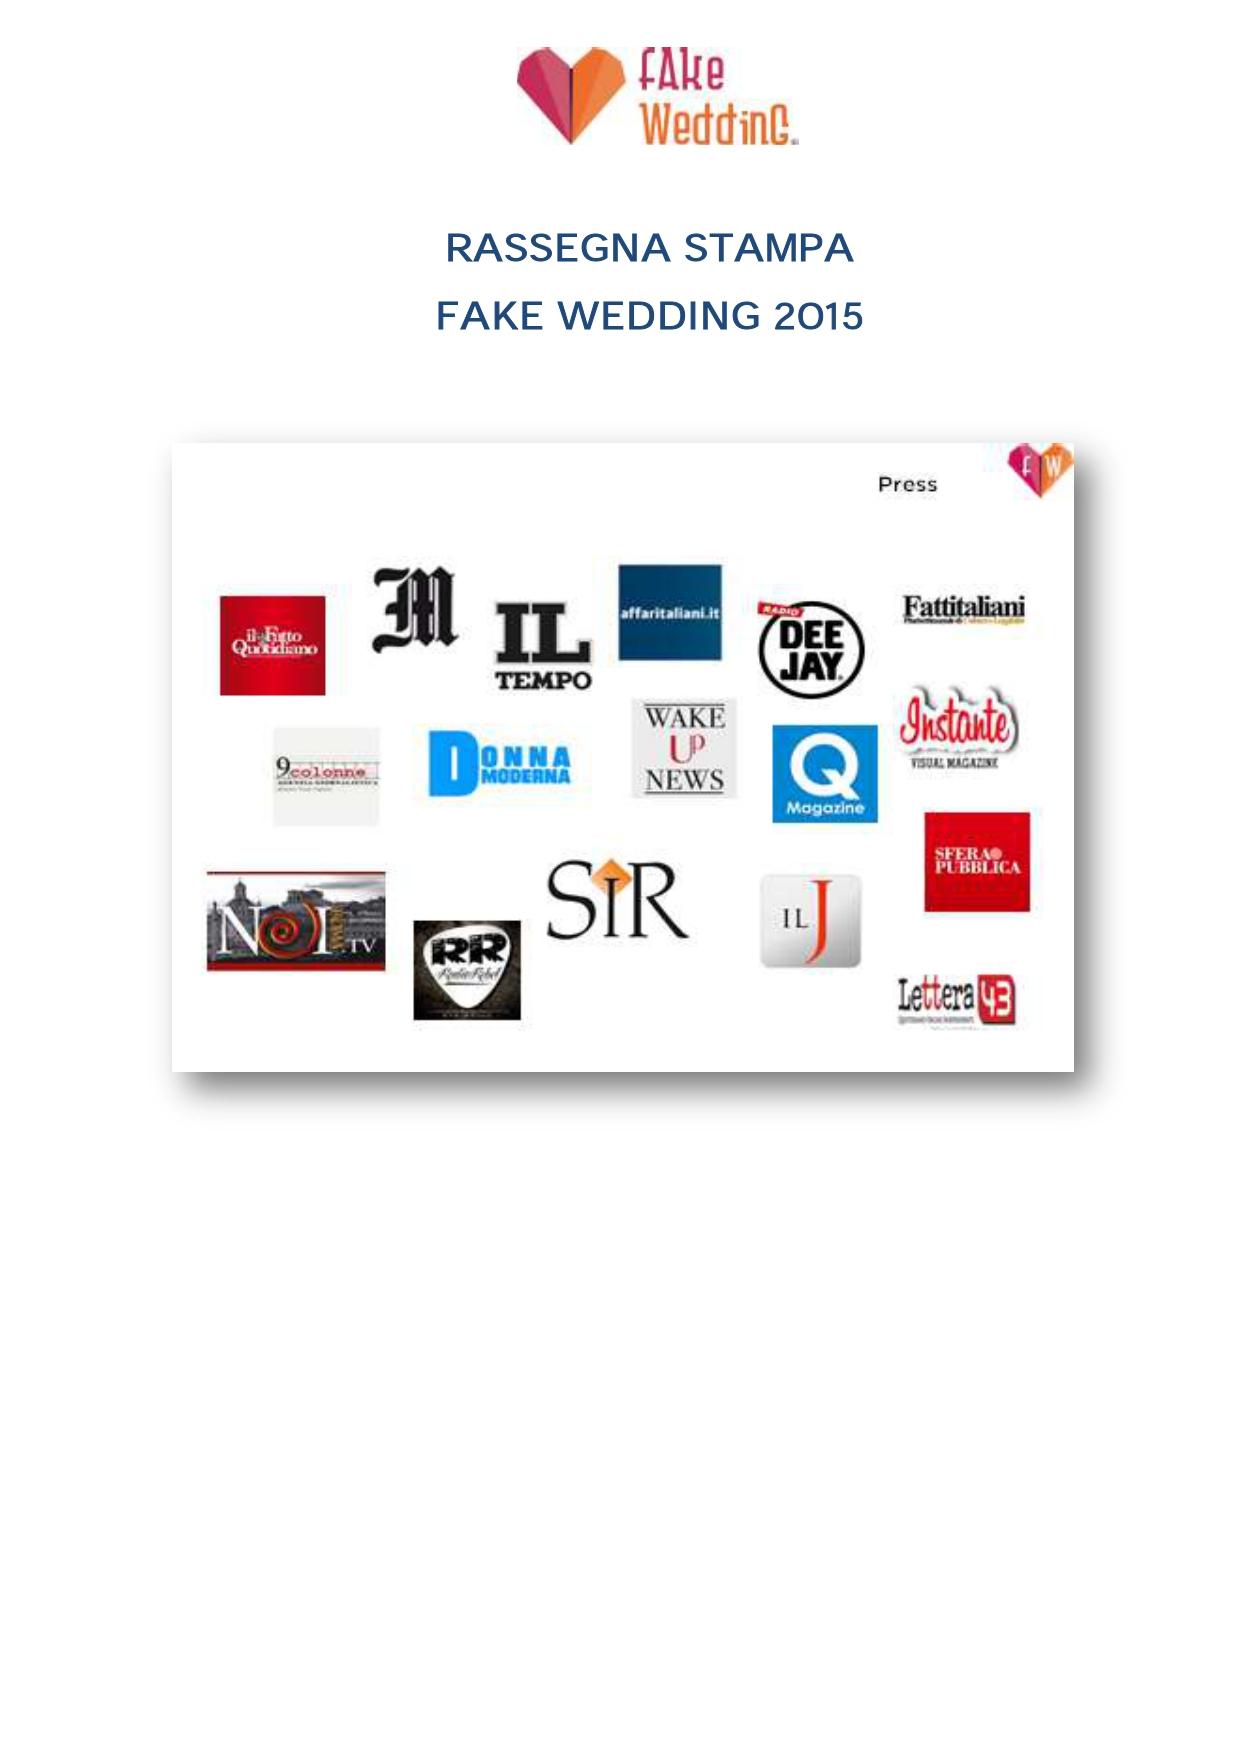 Fake Wedding rassegna stampa copertina